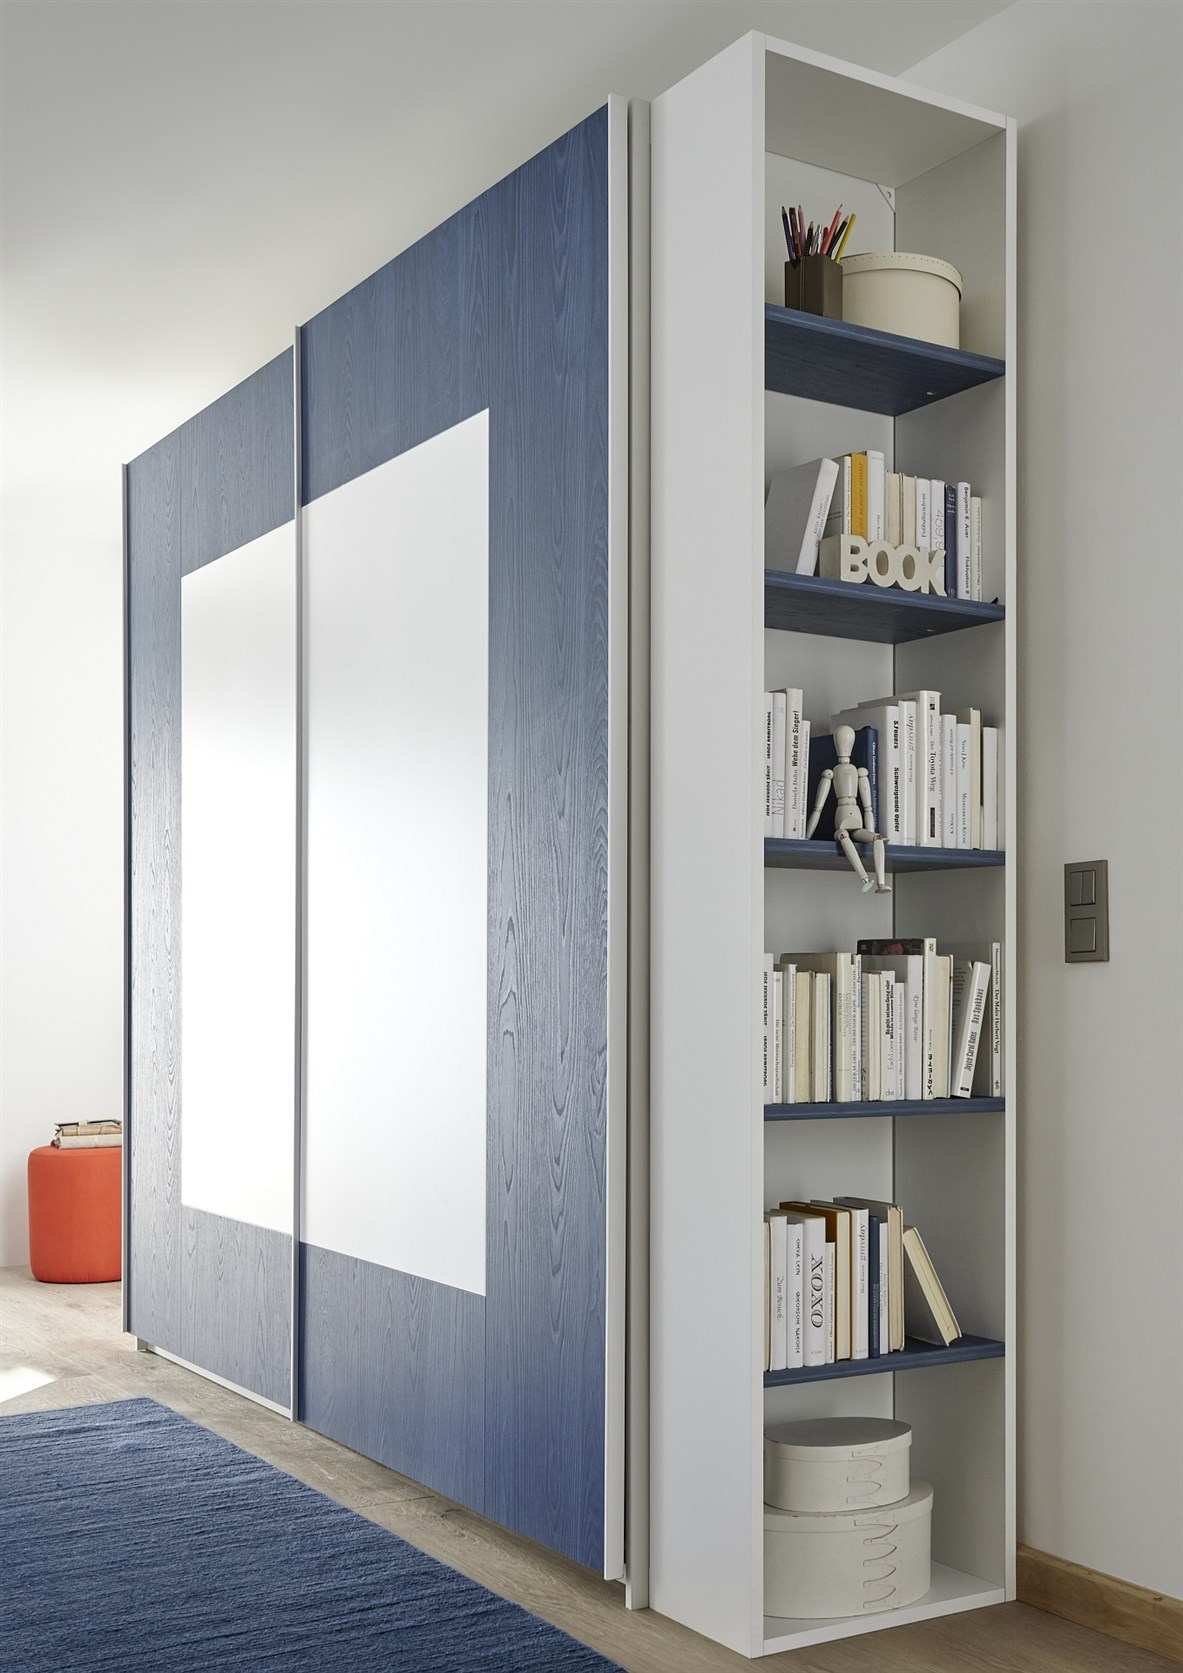 Enjoy Milieu 4 Blau Detail Regal LQ (1)